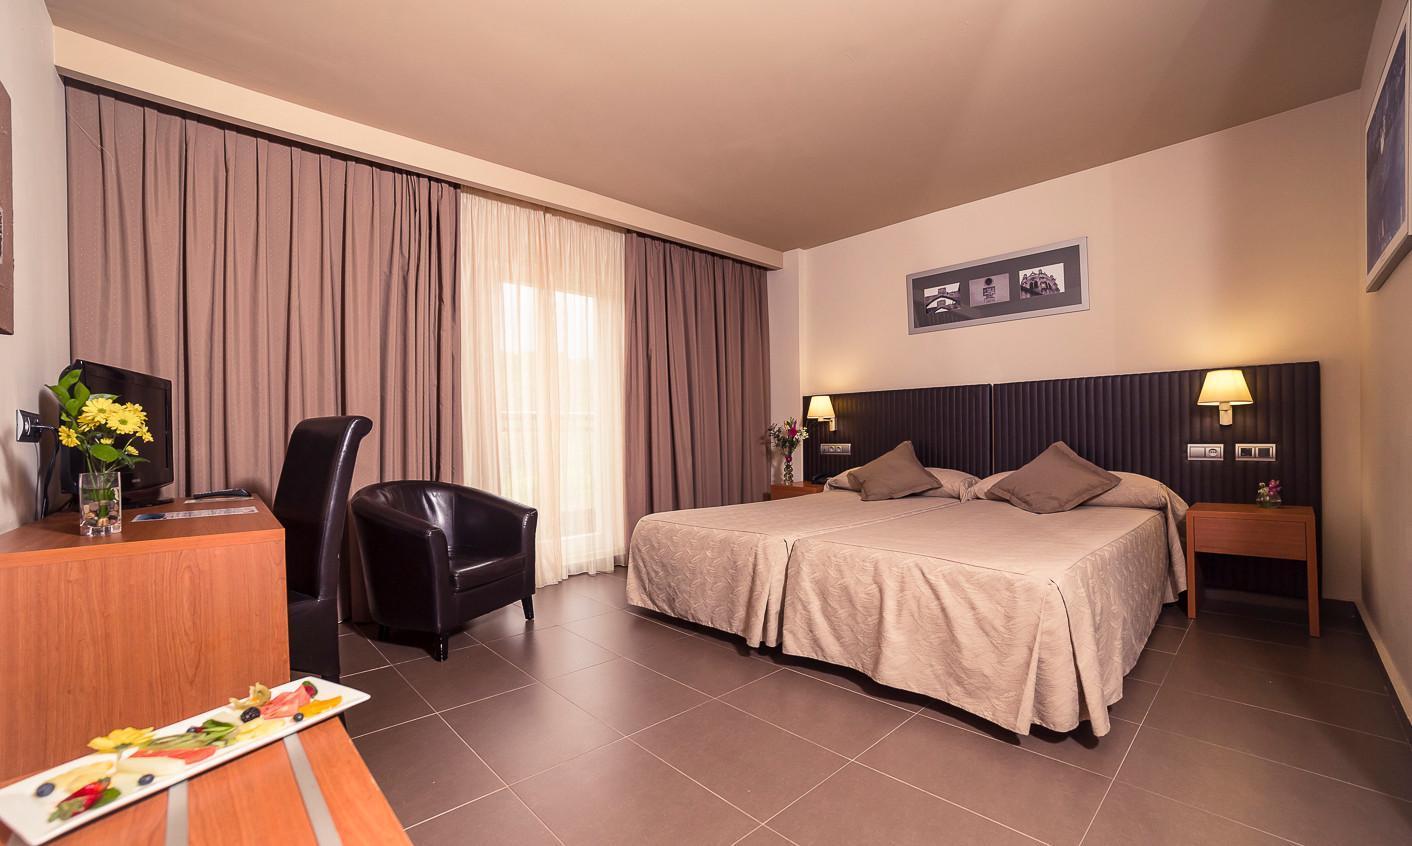 Hotel Classy 2 Bedrooms Private Villa Seminyak - Kuta Bali Indonesia - Bali